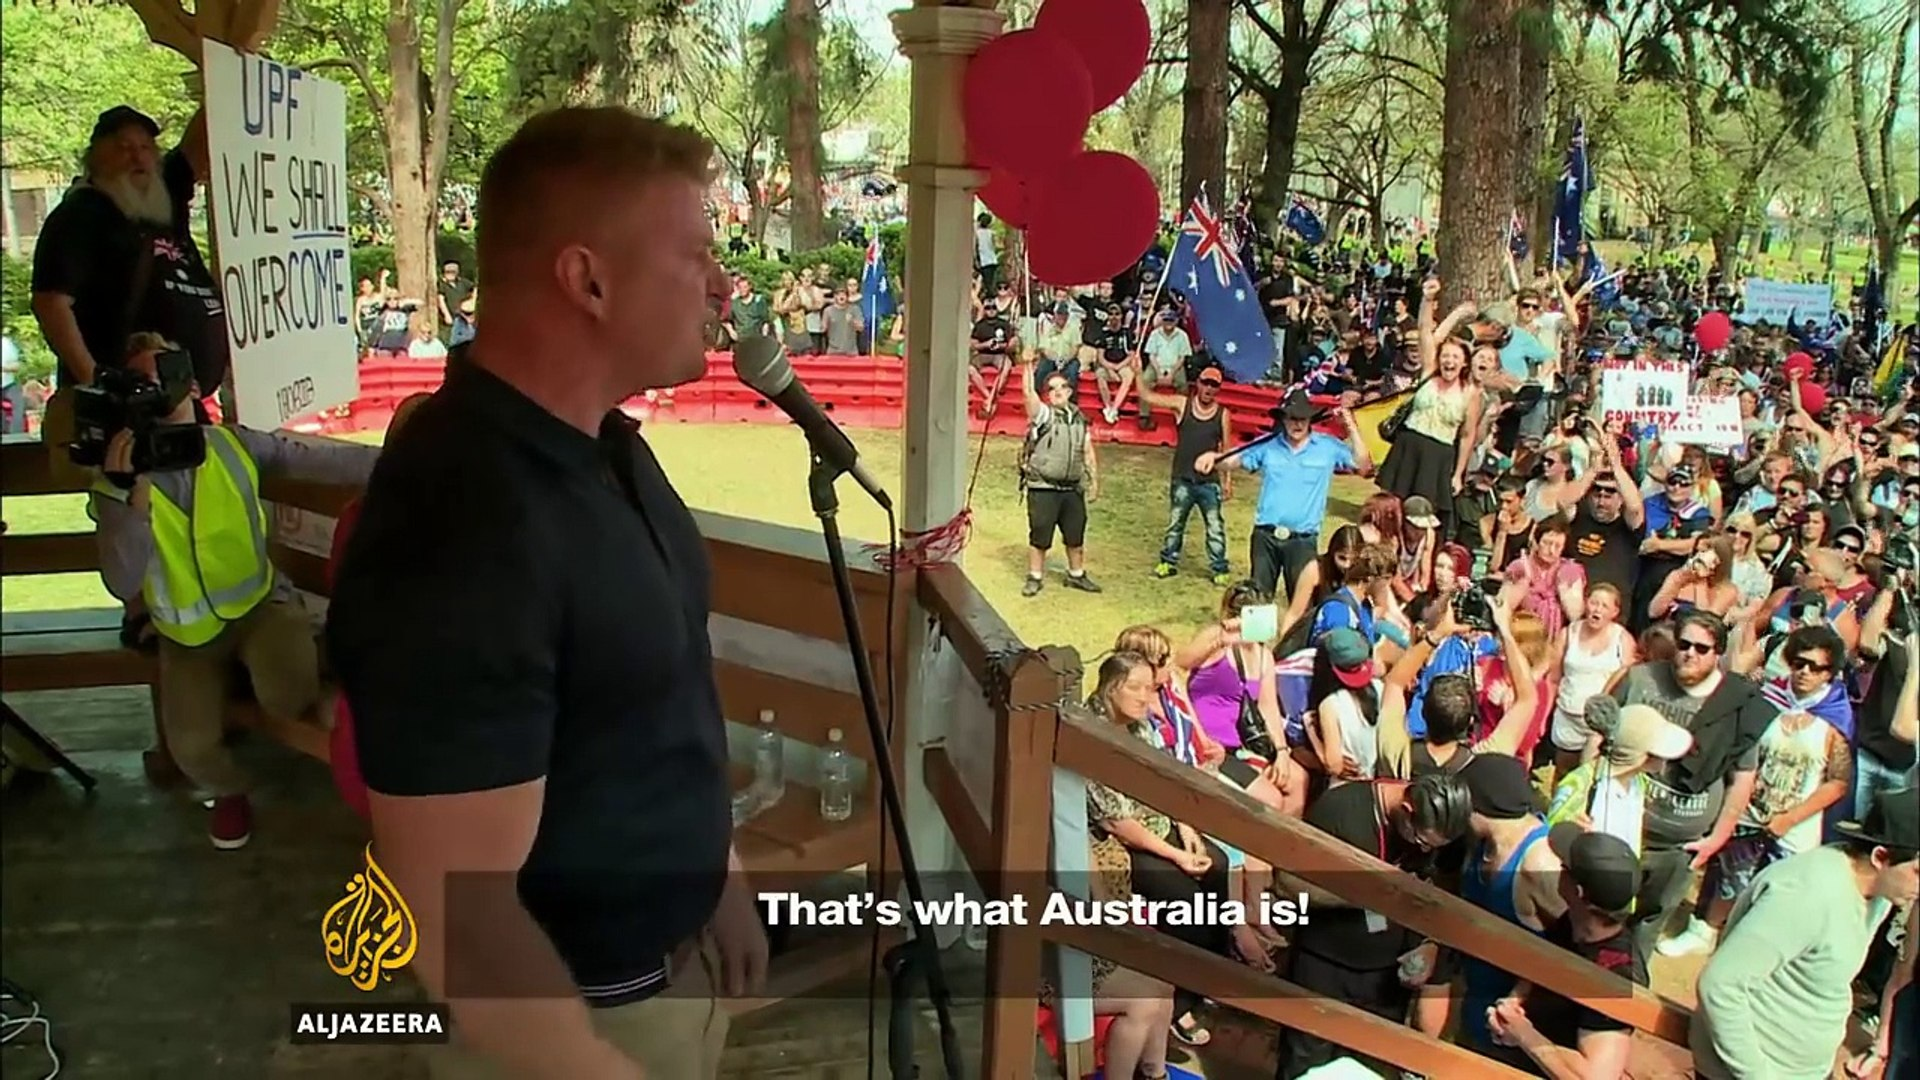 The Great Divide: Islamophobia in Australia - 101 East